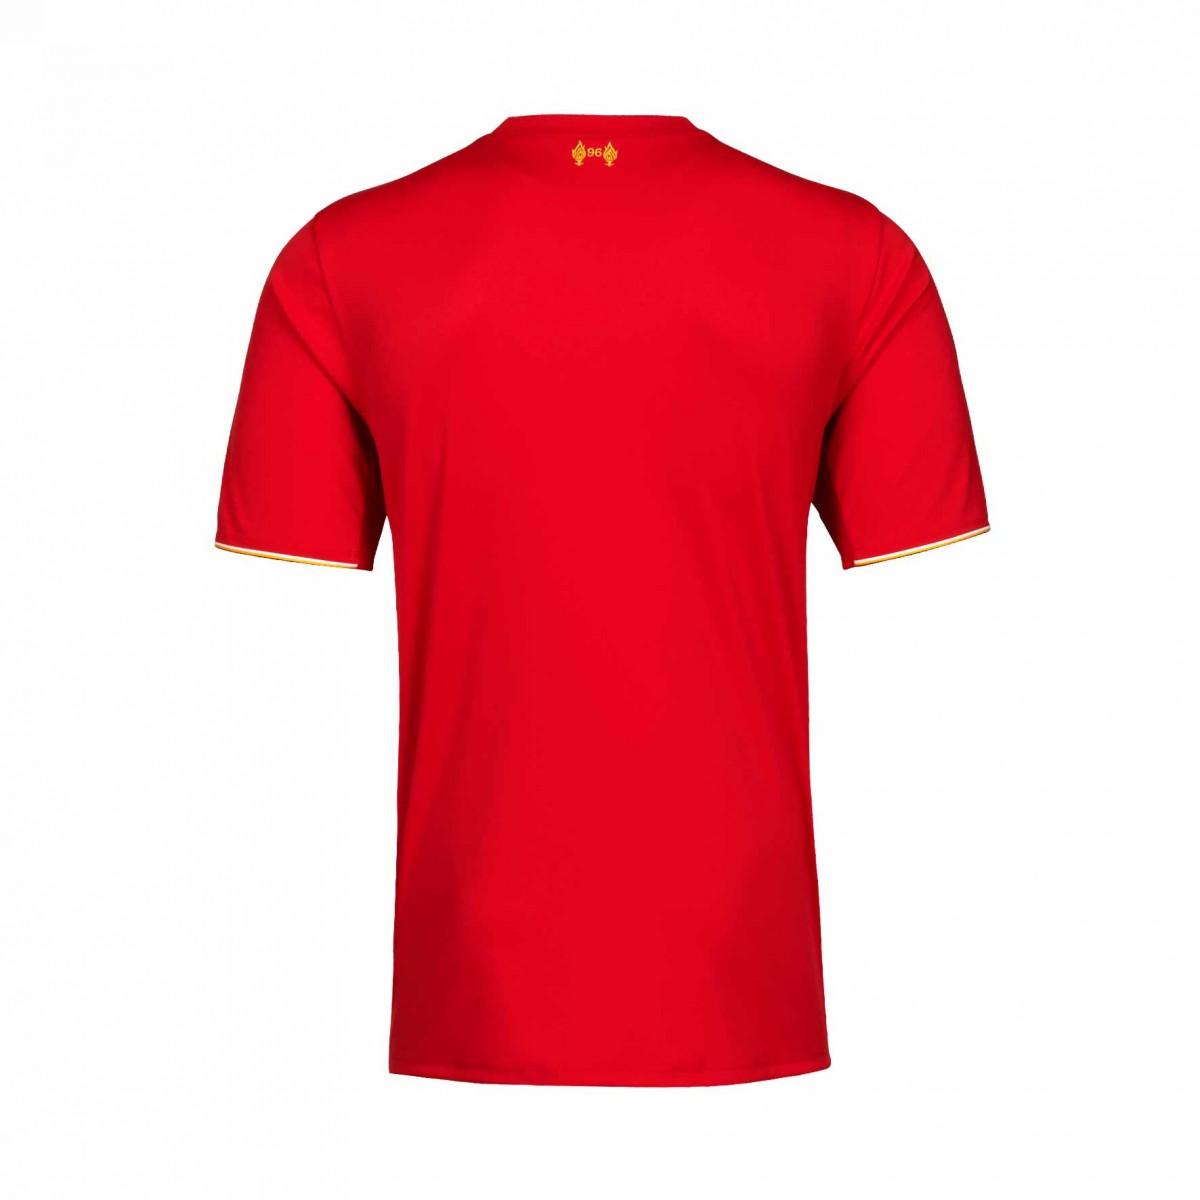 huge discount 1b371 cece9 Liverpool 15/16 New Balance Home Football Shirt | 15/16 Kits ...